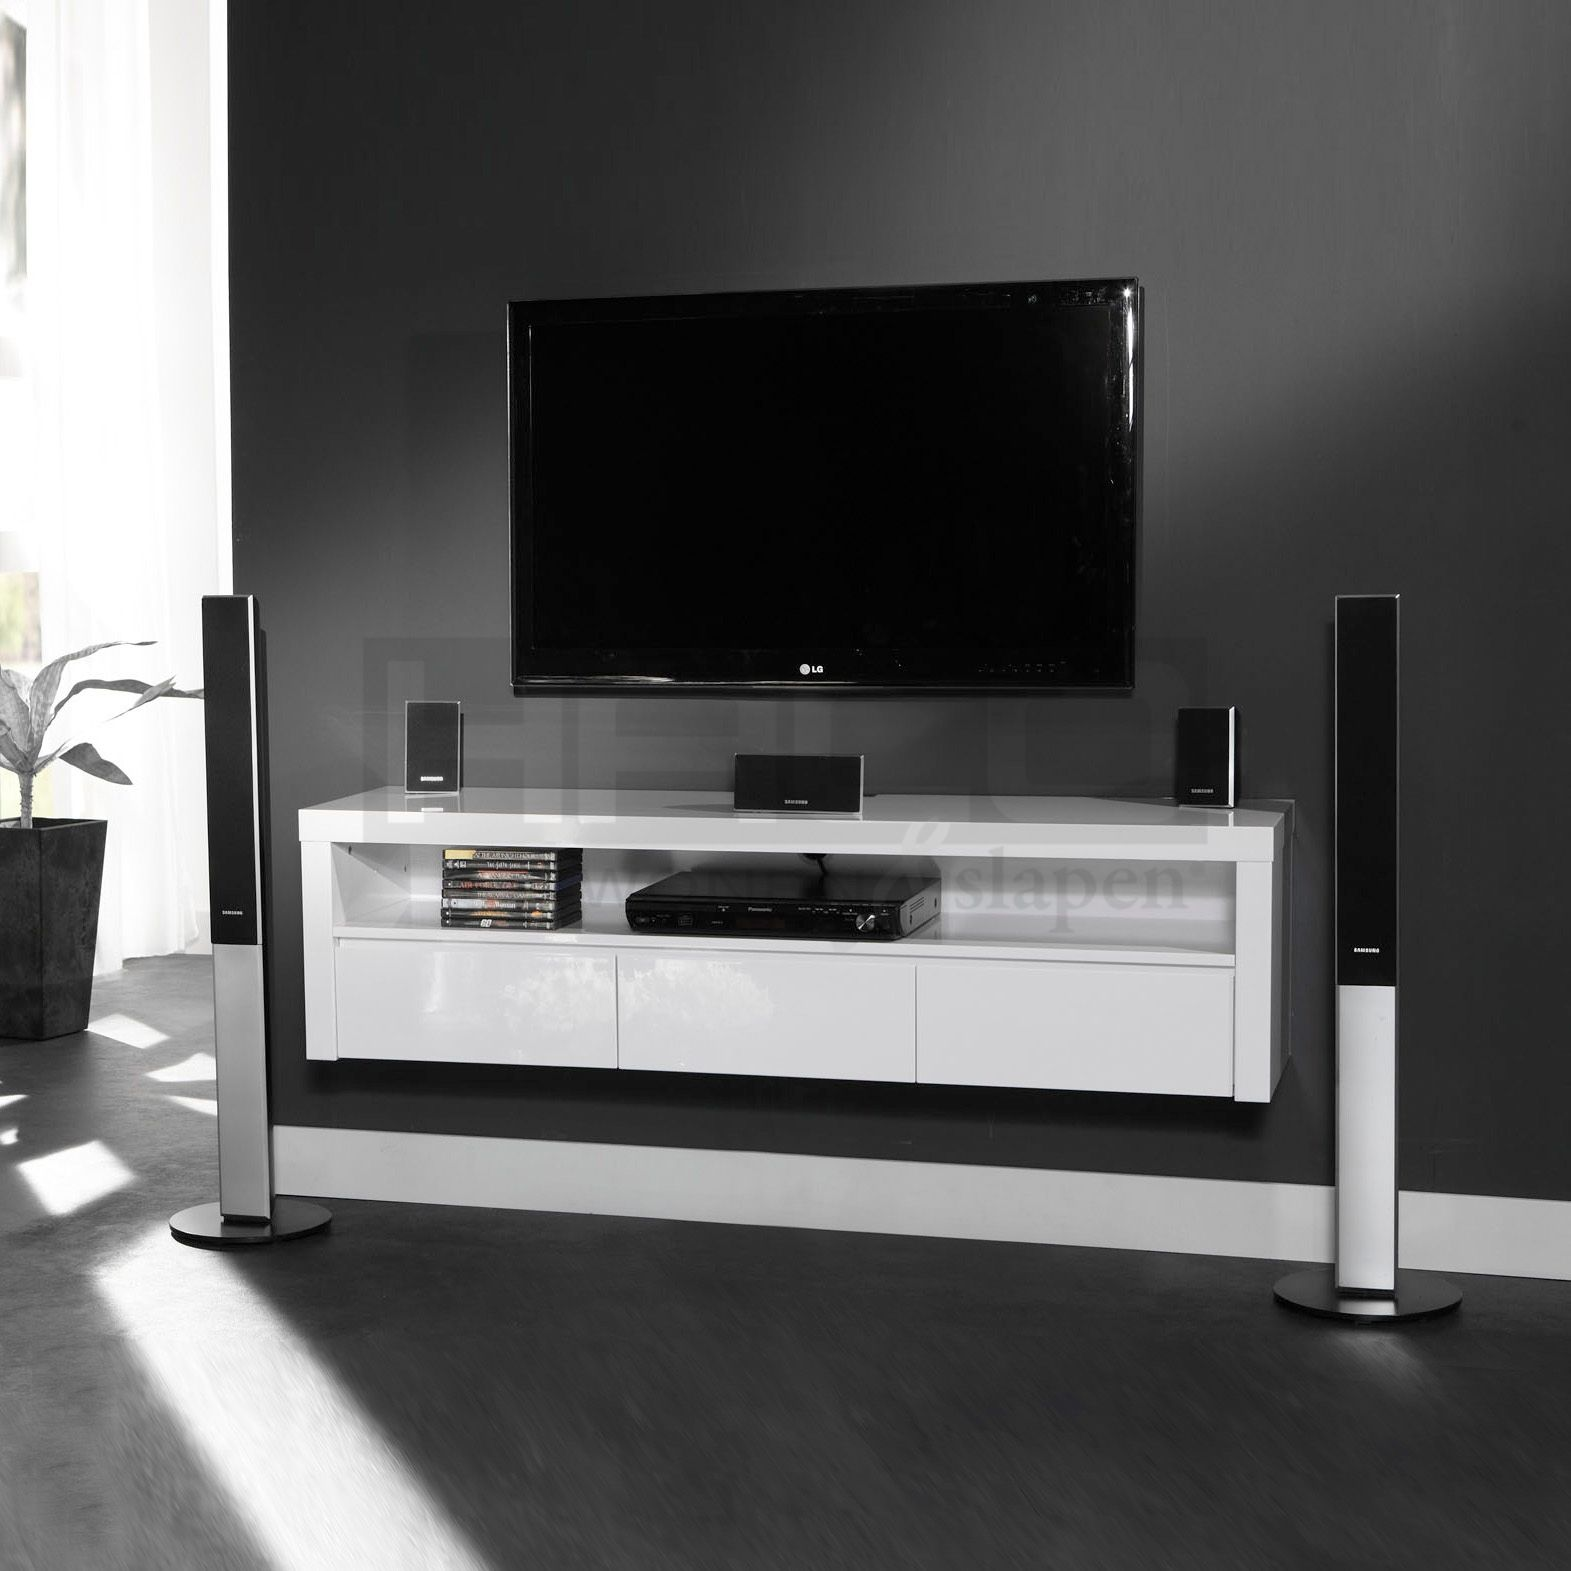 Tv Meubel Cool.Haco Tv Meubel Hangend Cool 150cm Meuble Tv Chambre Meuble Tv